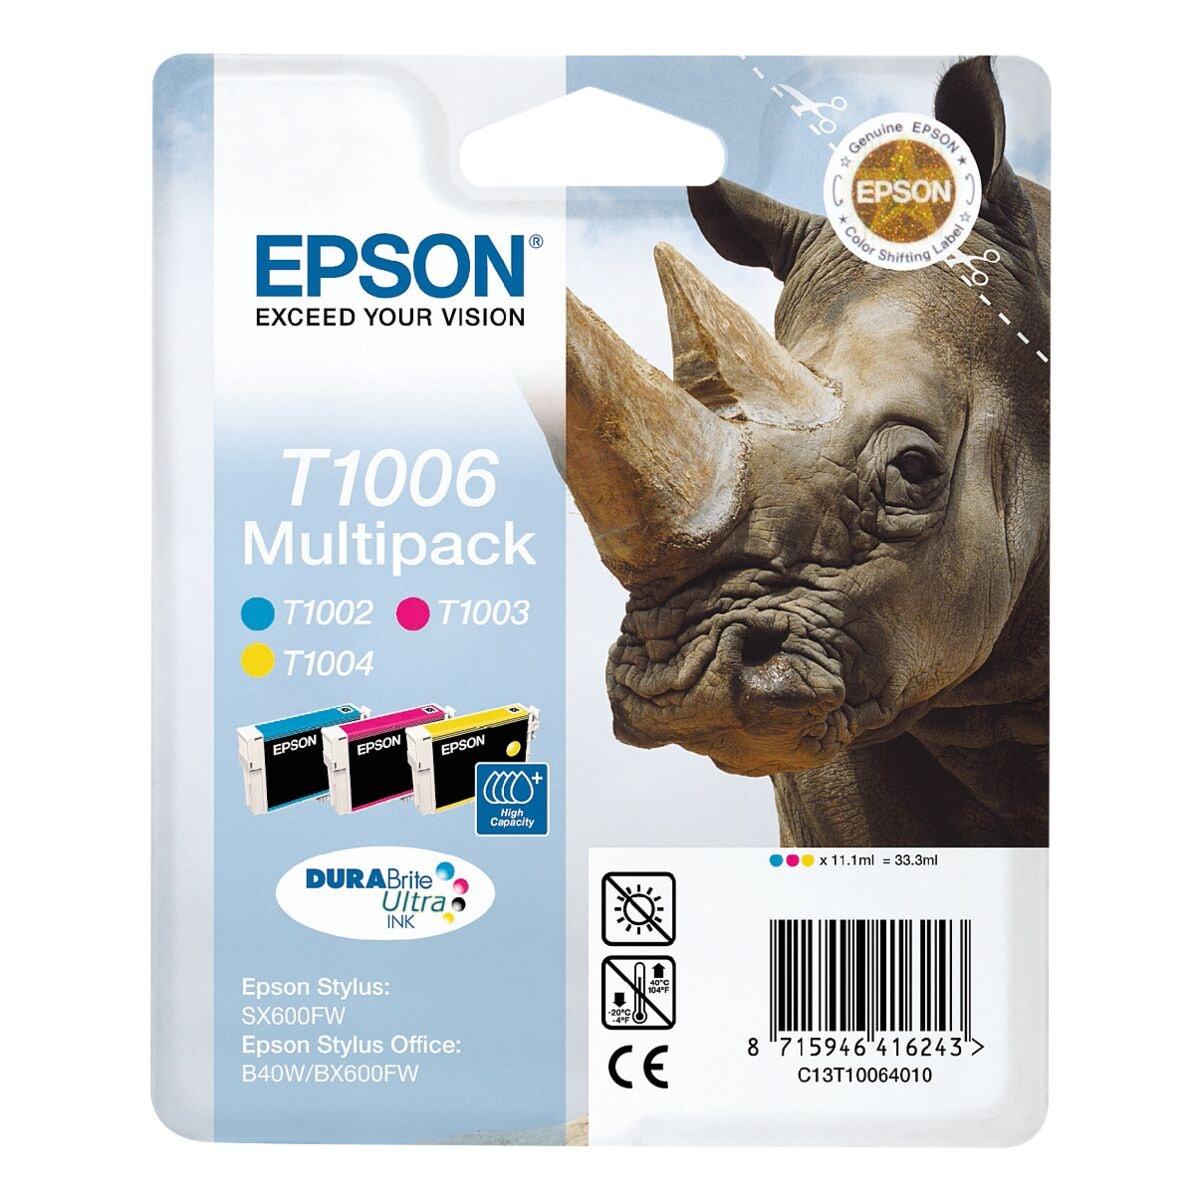 epson tintenpatronen set t10064010 nr t1006 bei otto. Black Bedroom Furniture Sets. Home Design Ideas